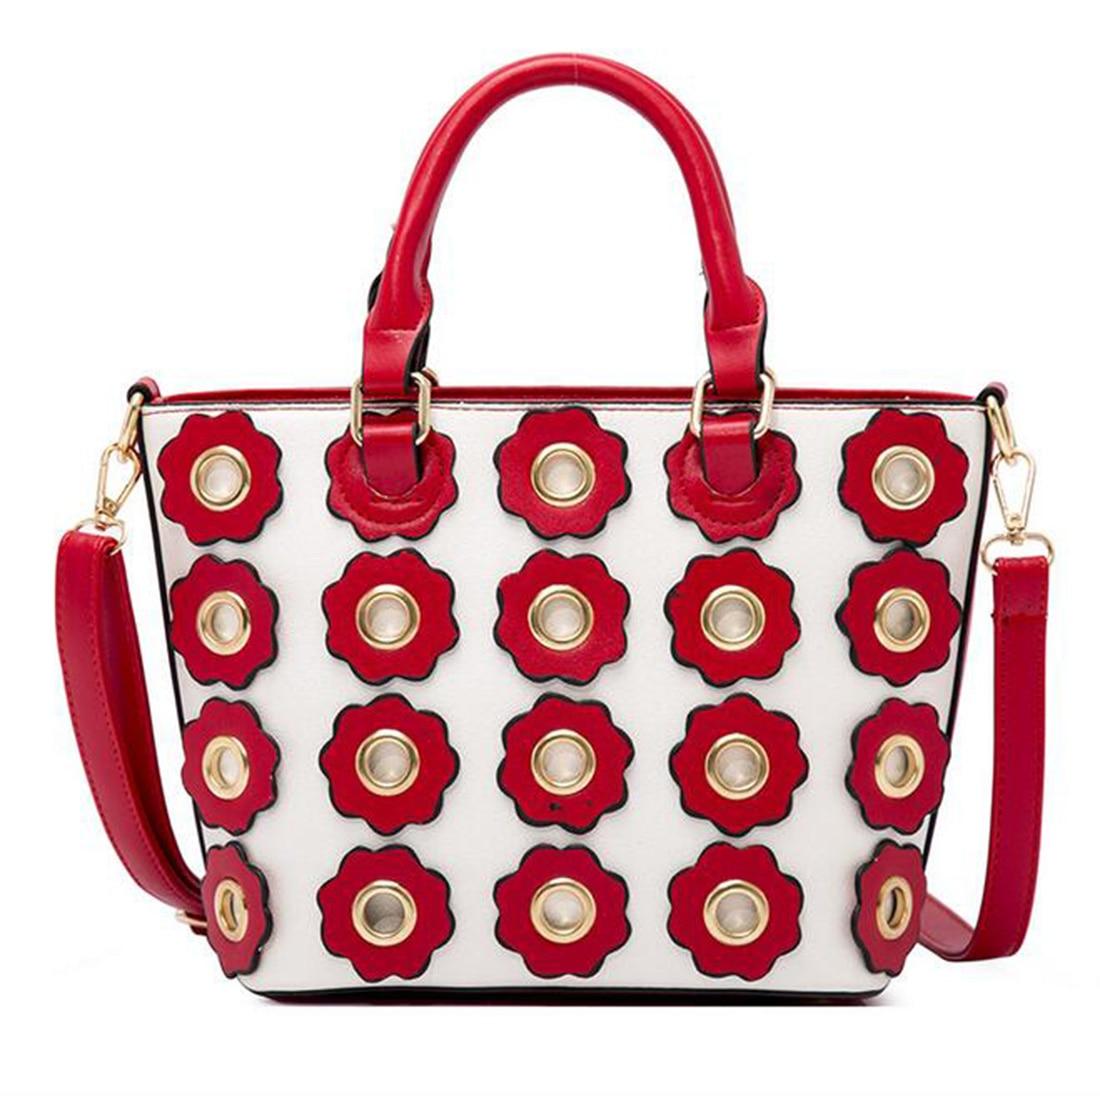 YEJIA FASHION Flower Luxury Handbag Women Bag Large Capacity Casual Totes Bags Female Shoulder Bags Summer Beach Handle Bag